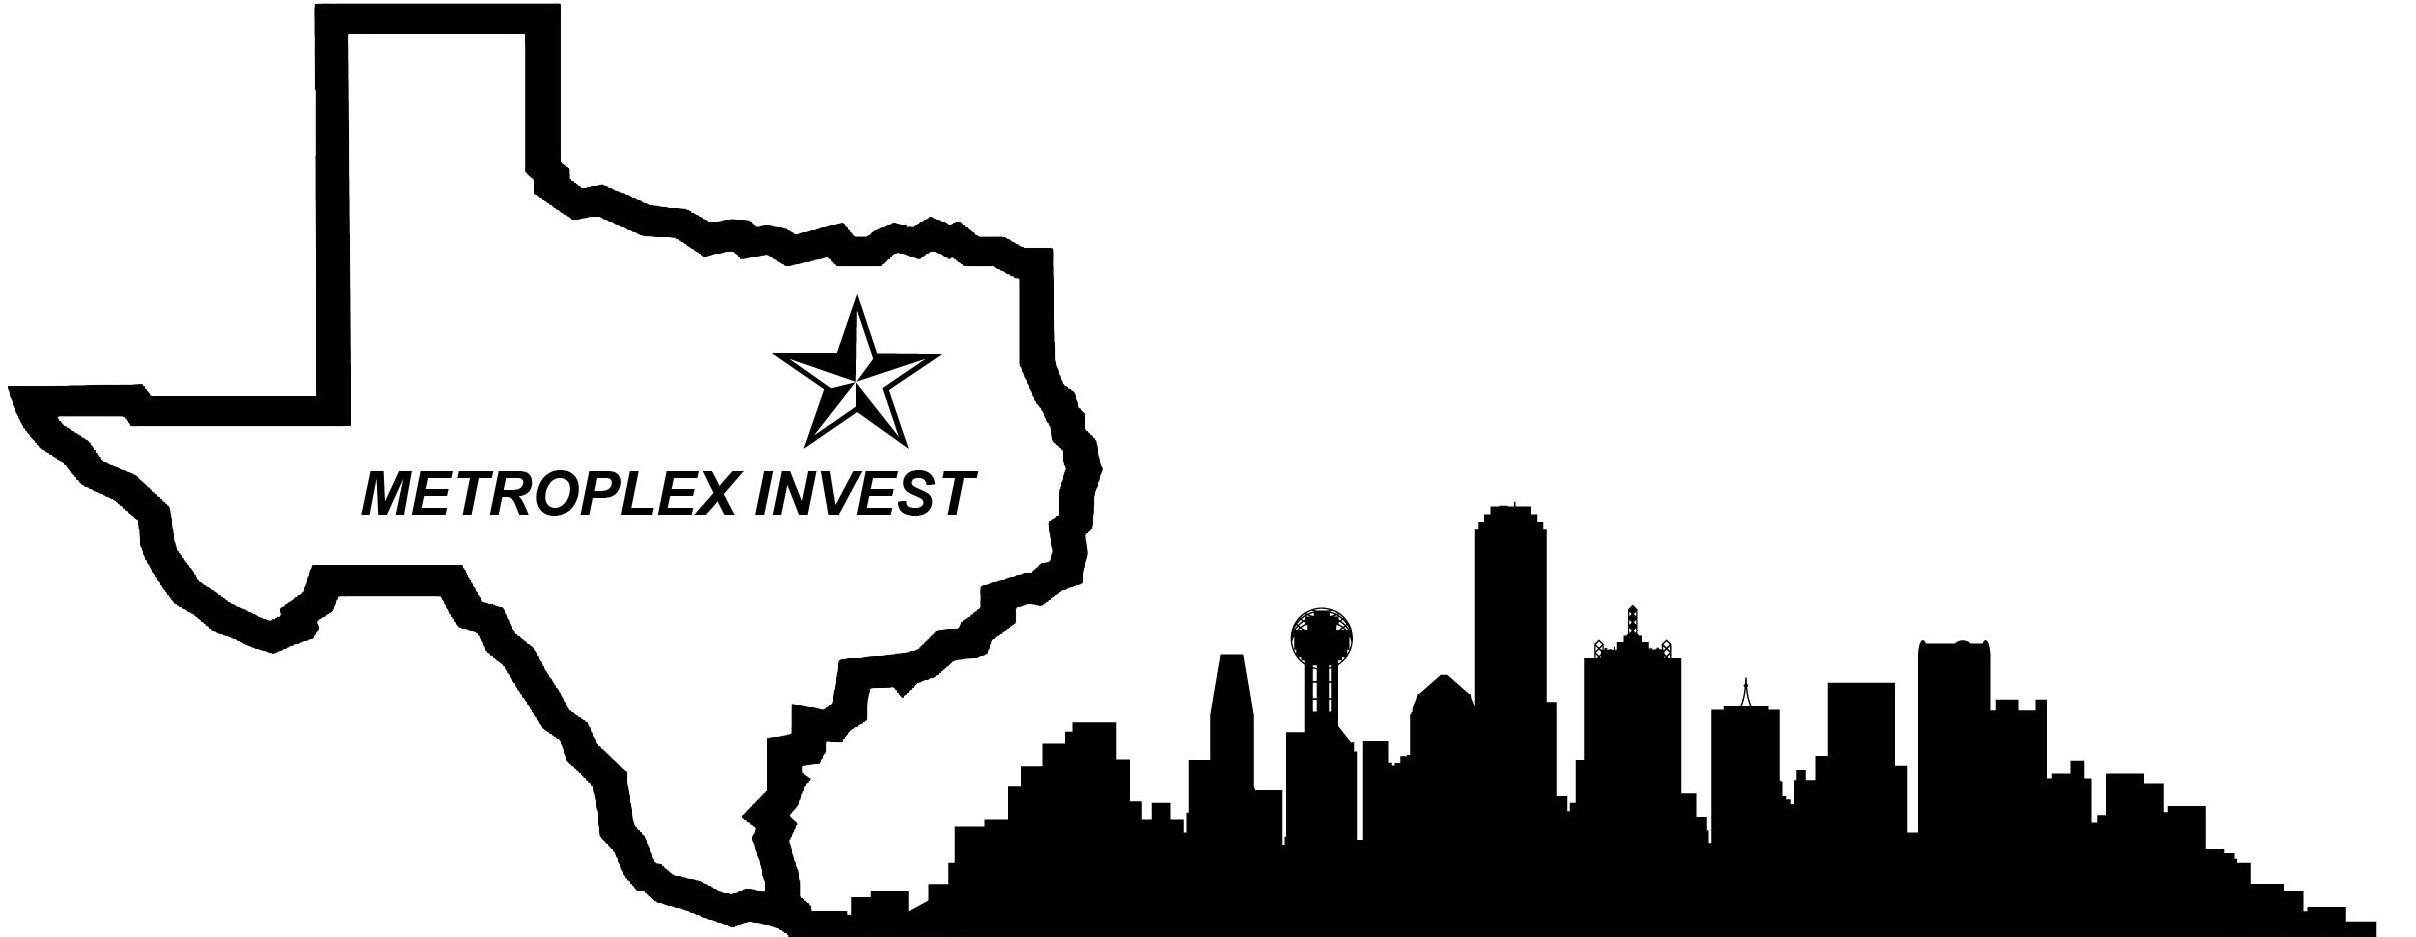 Metroplex Invest